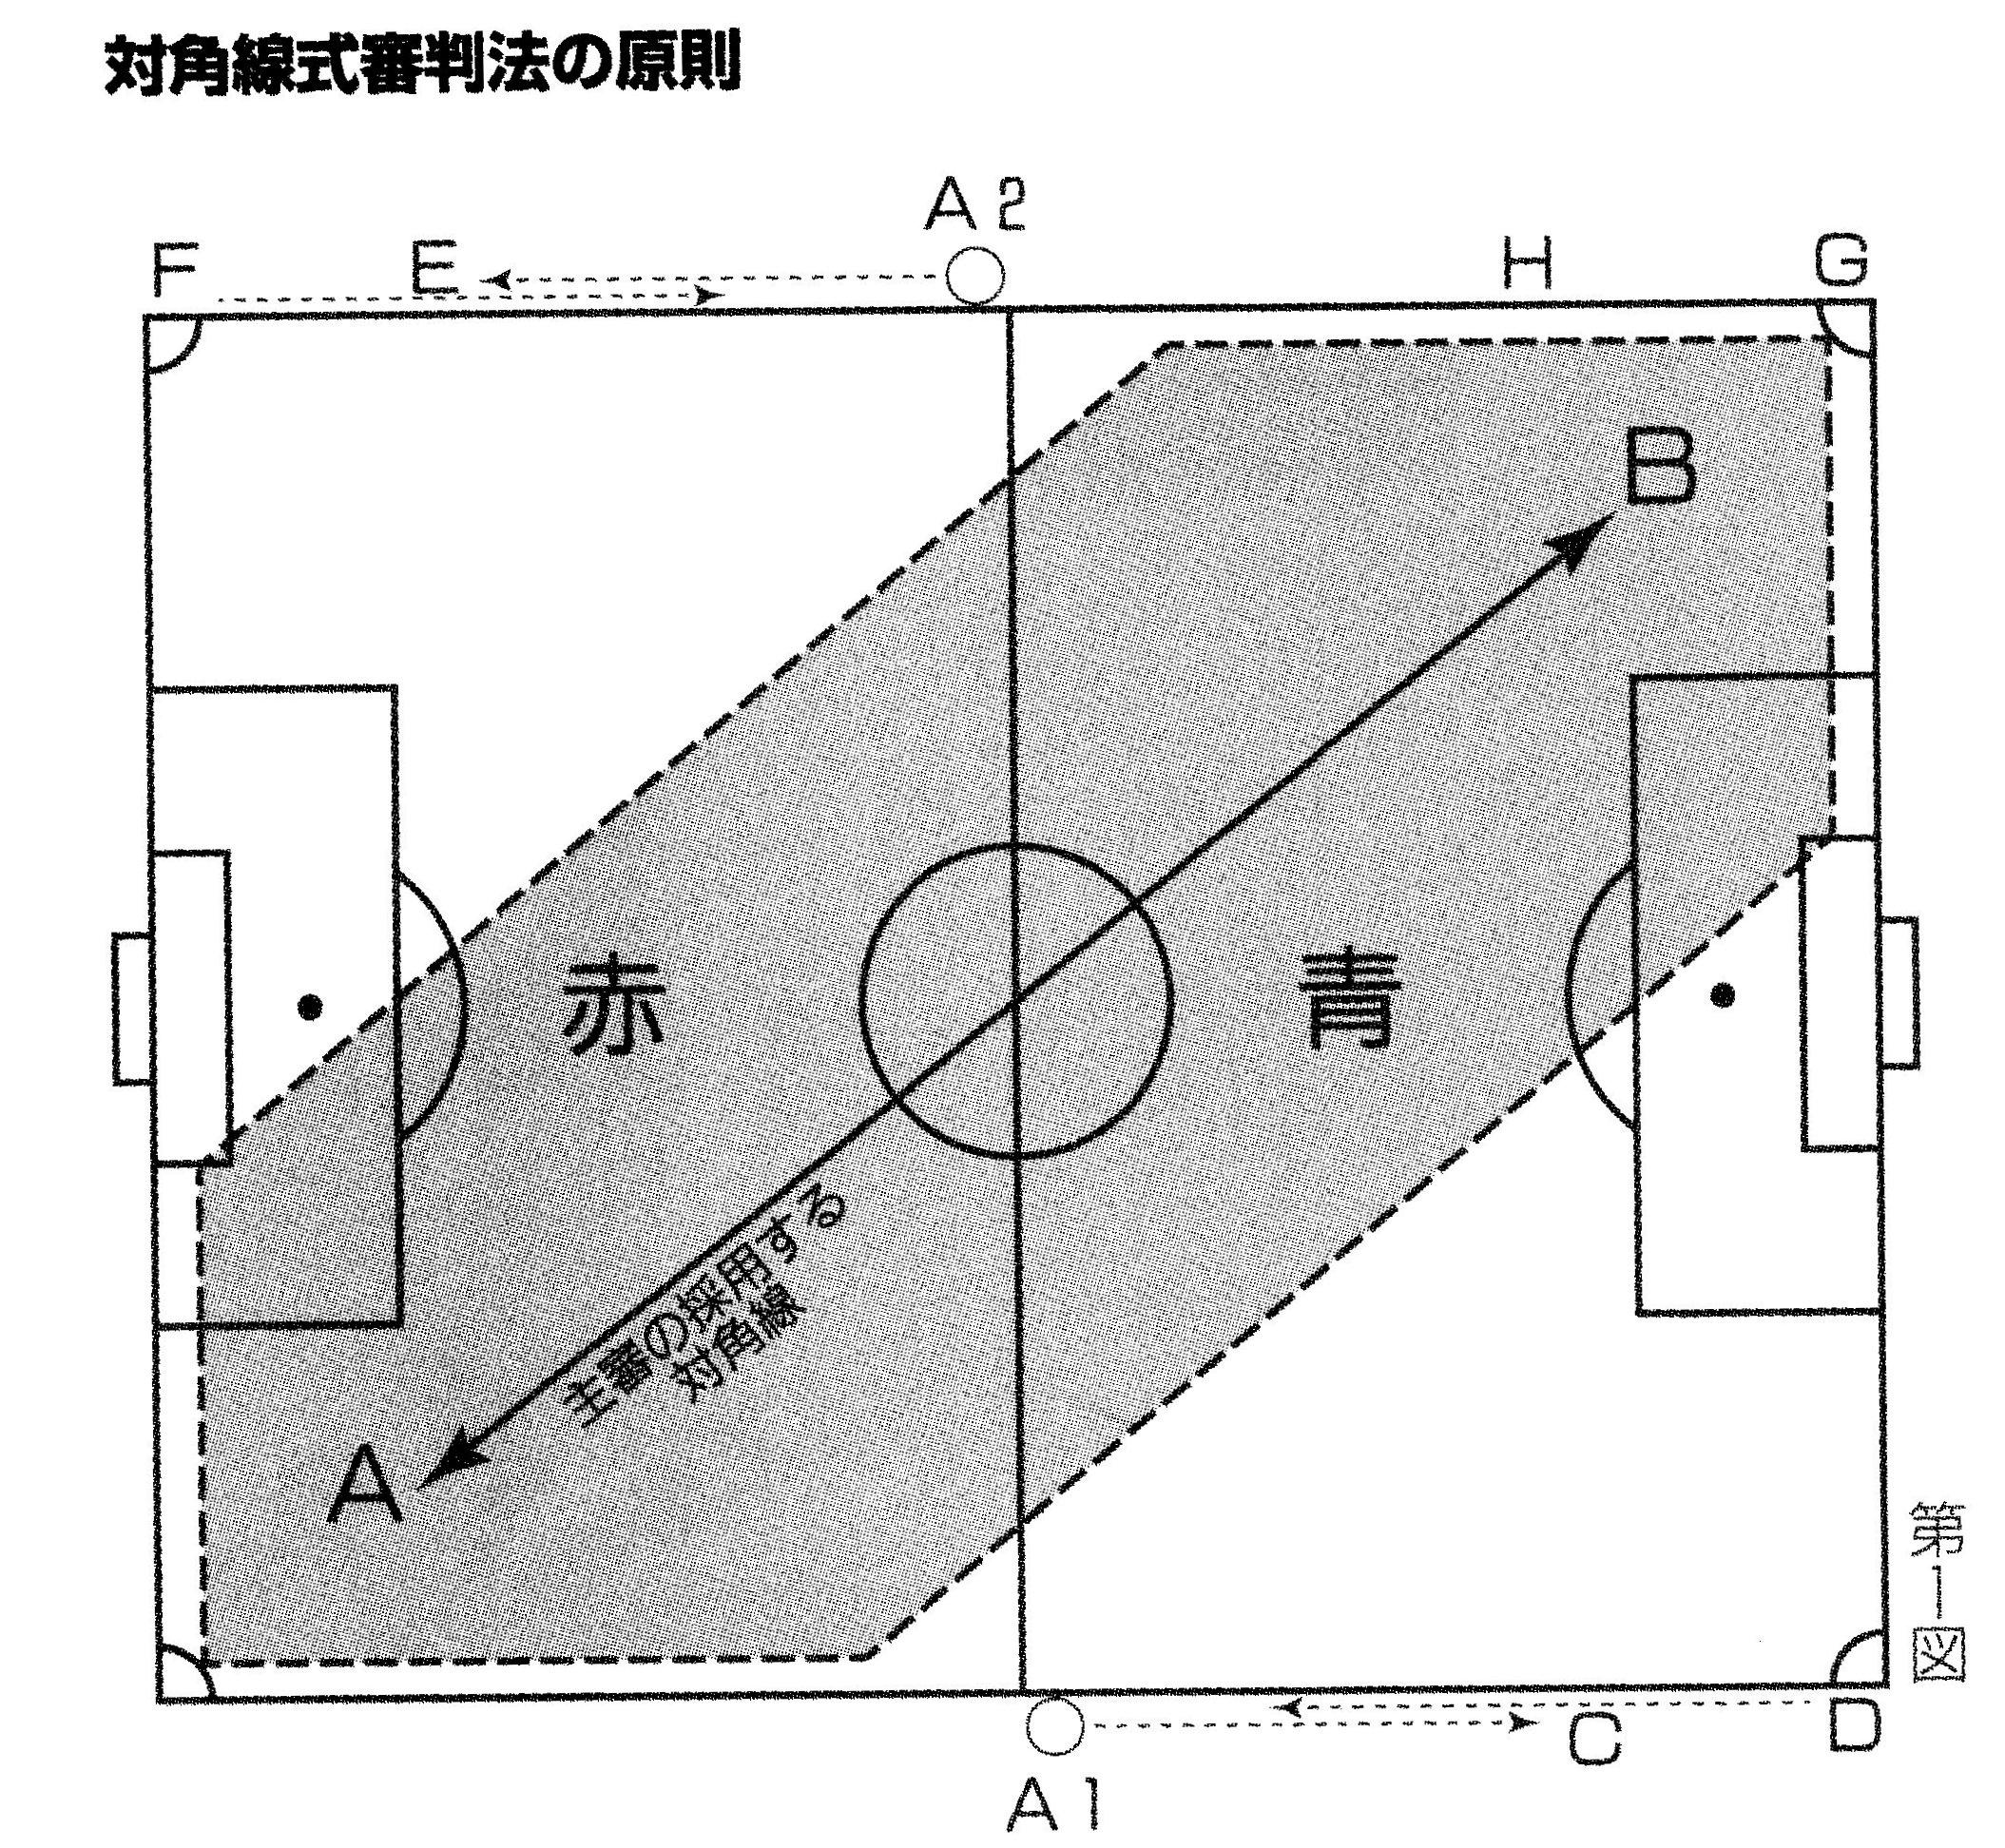 refereeing_001.jpg